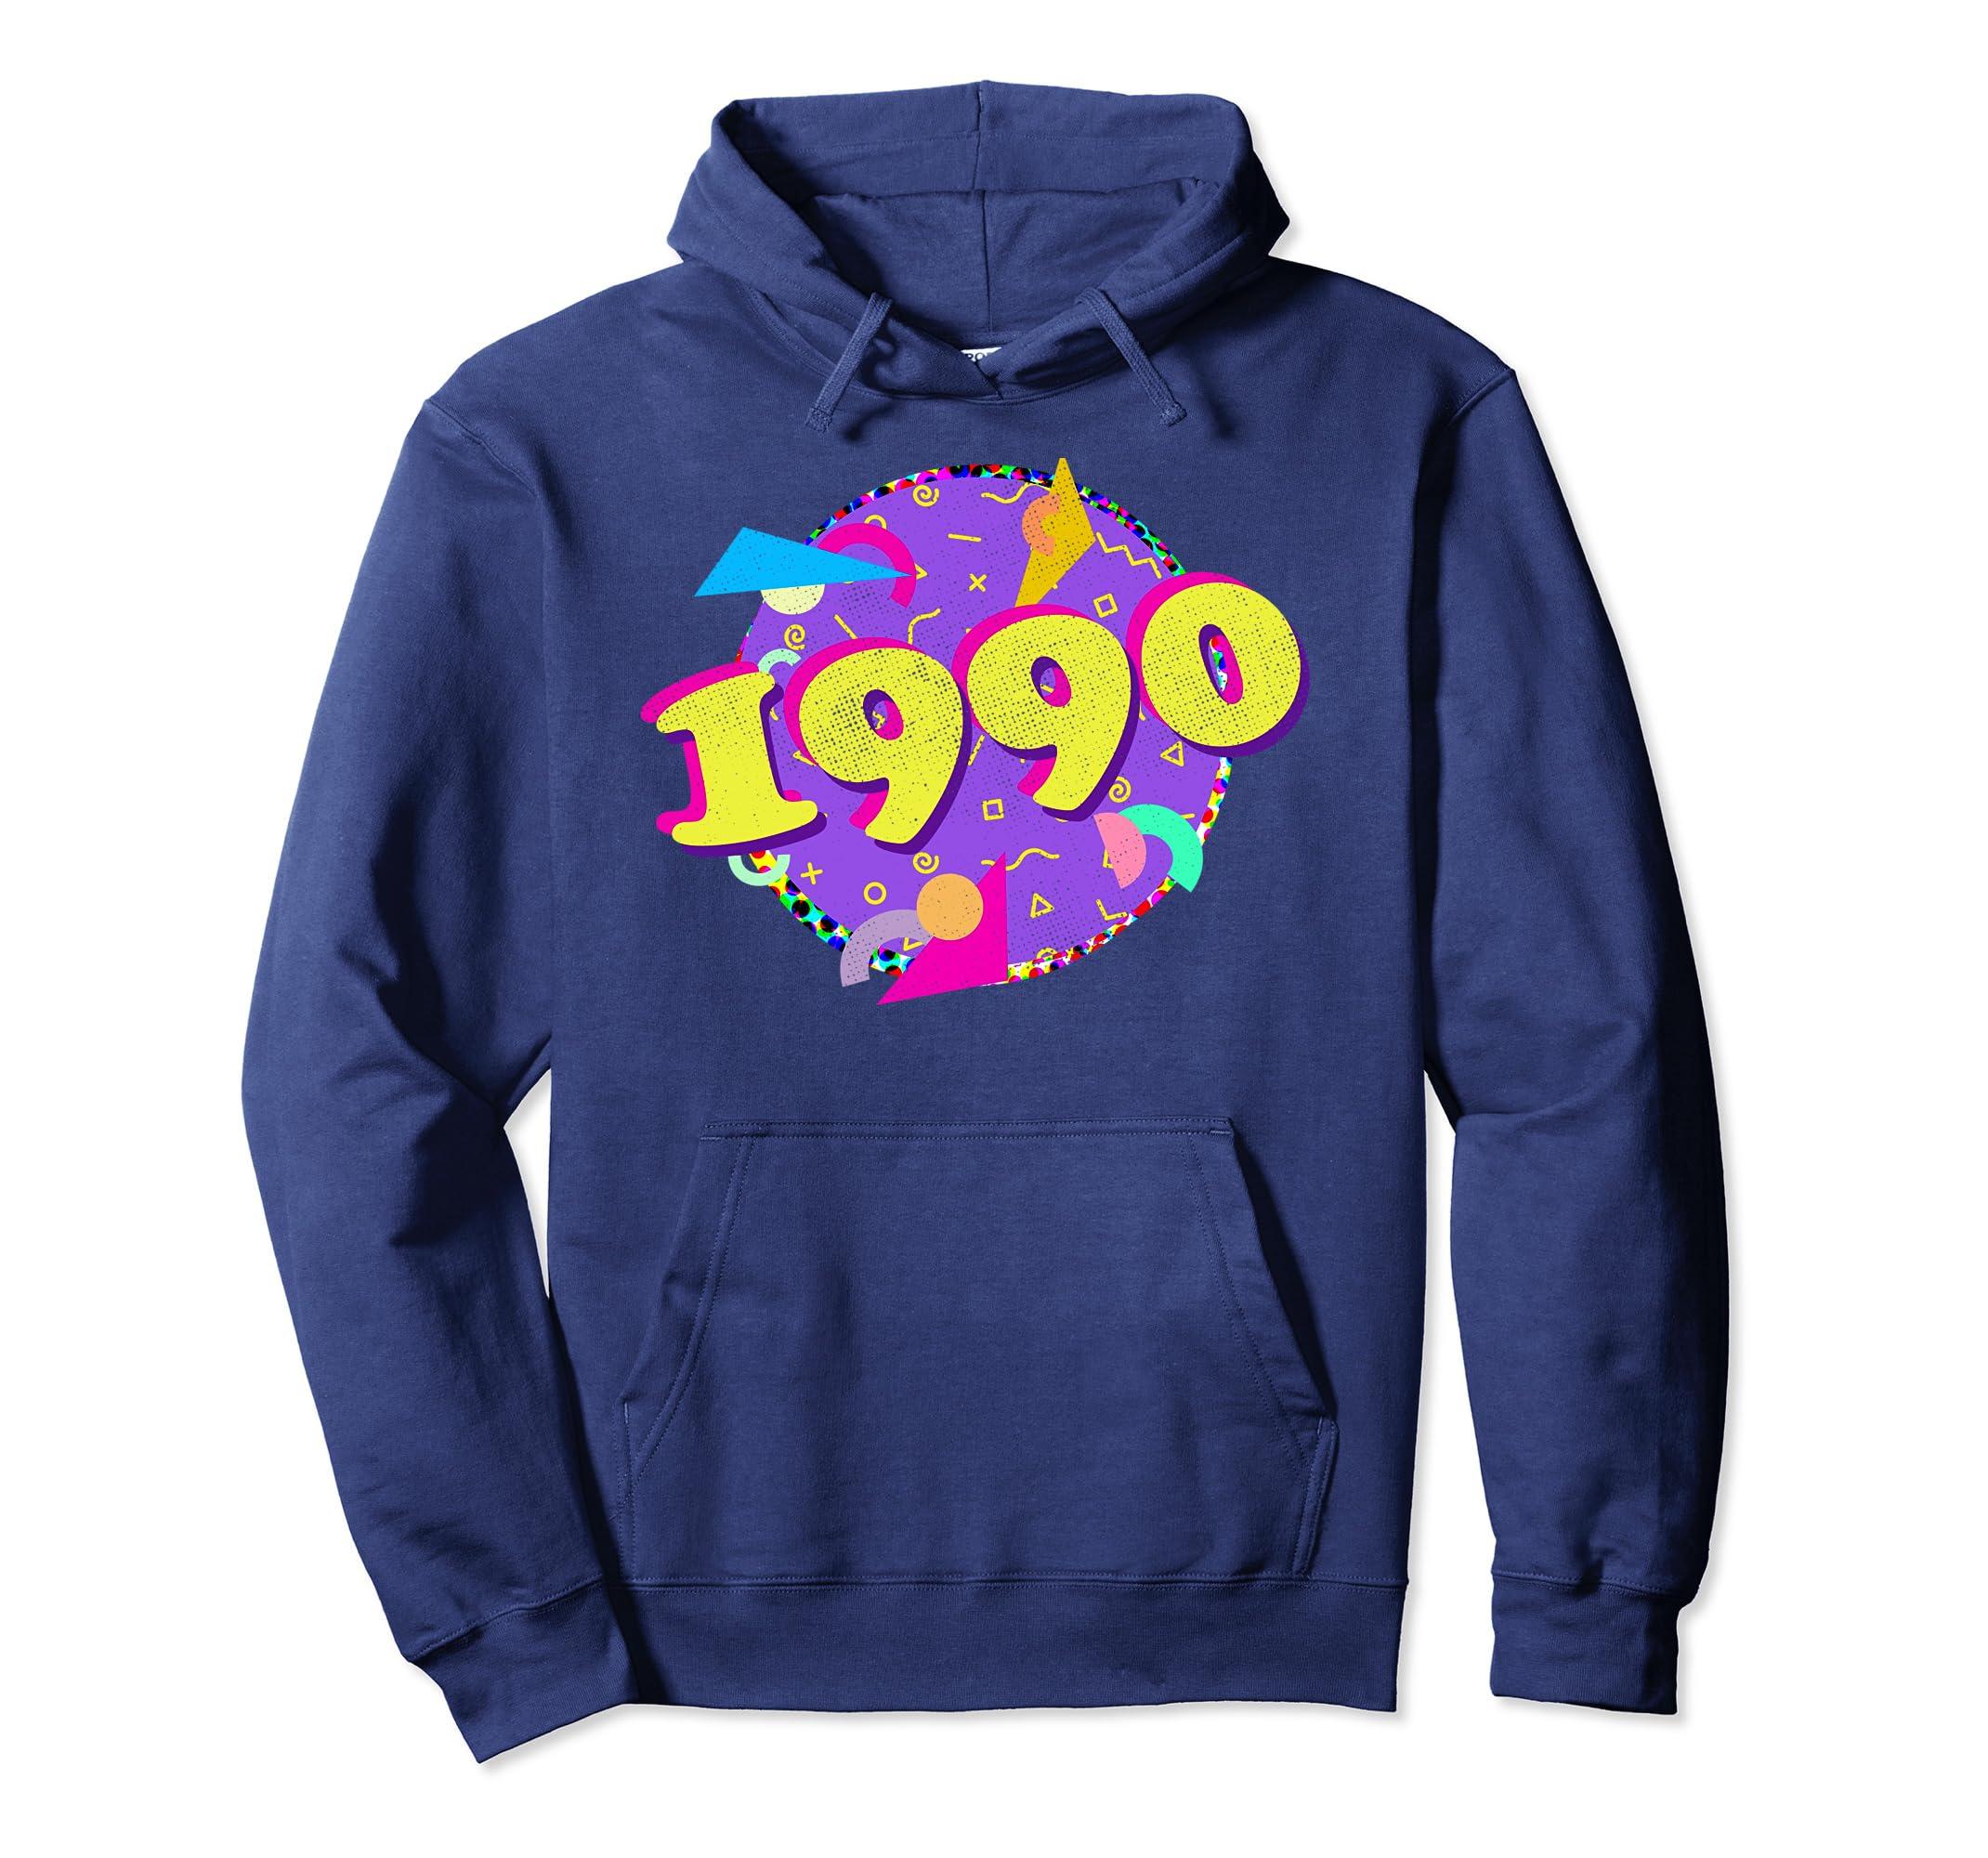 1990 Hoodie 28th Birthday Shirt Retro 90s Style